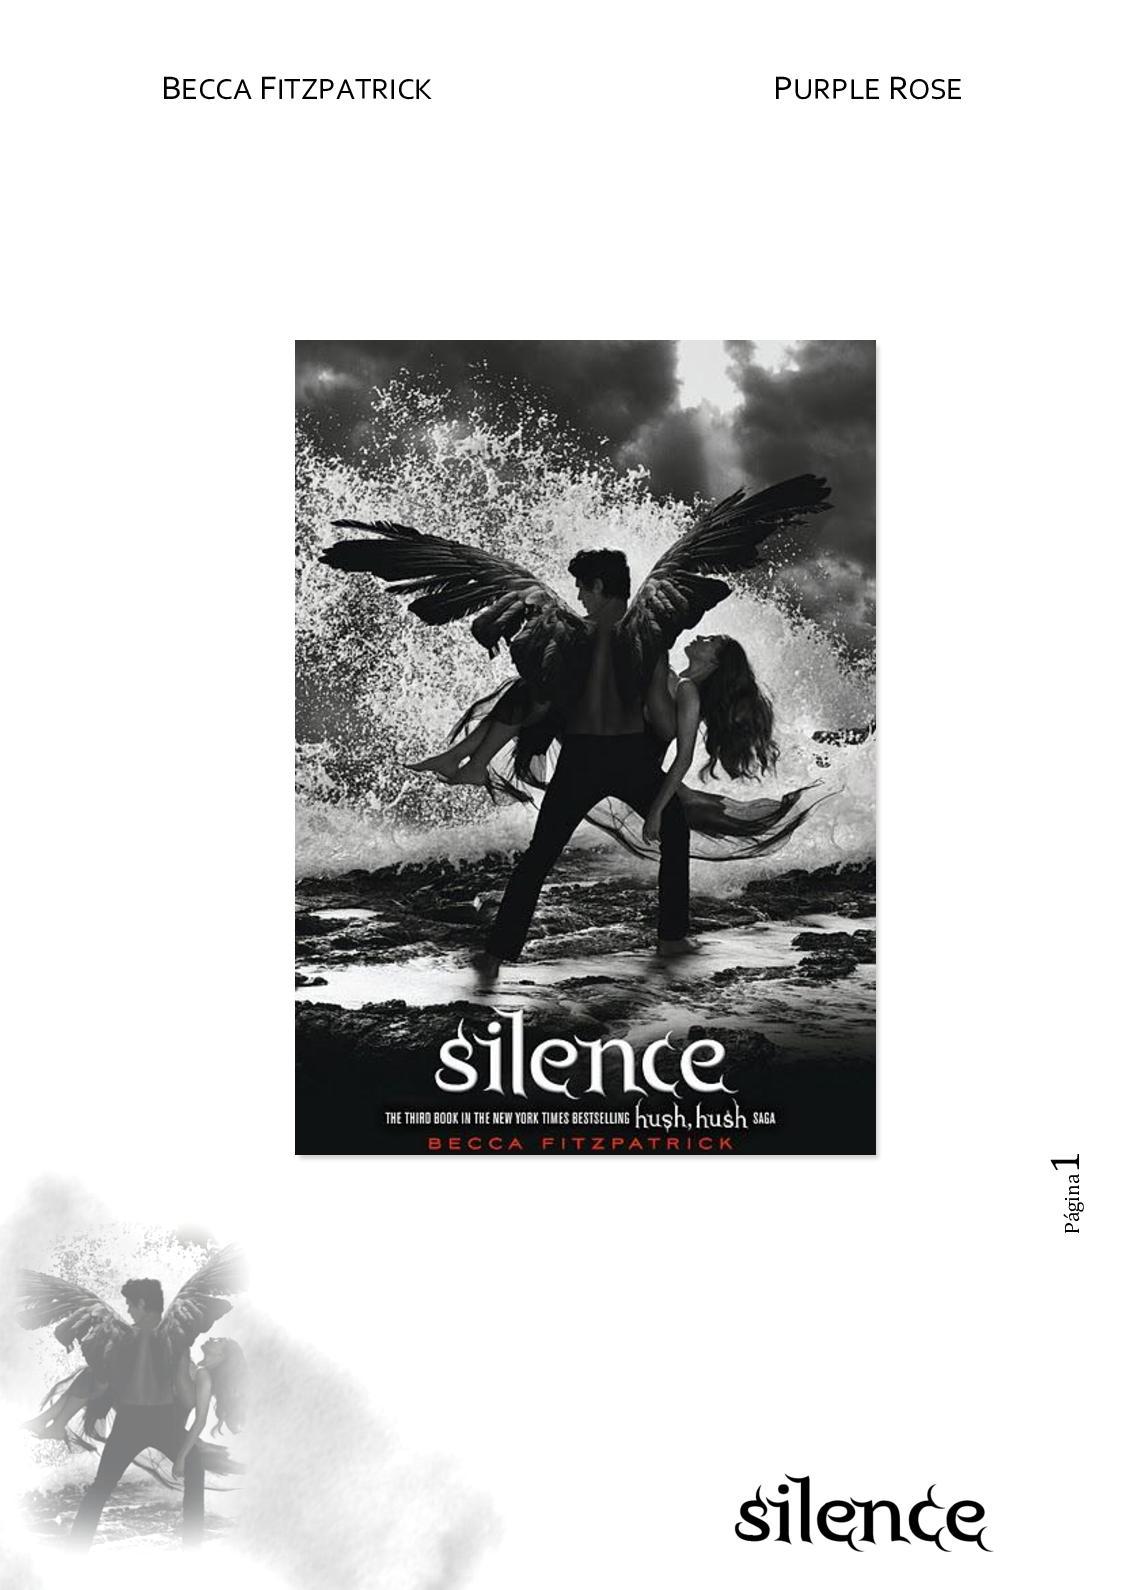 07c93bd0f Calaméo - Becca Fitzpatrick Hush Hush 03 Silence